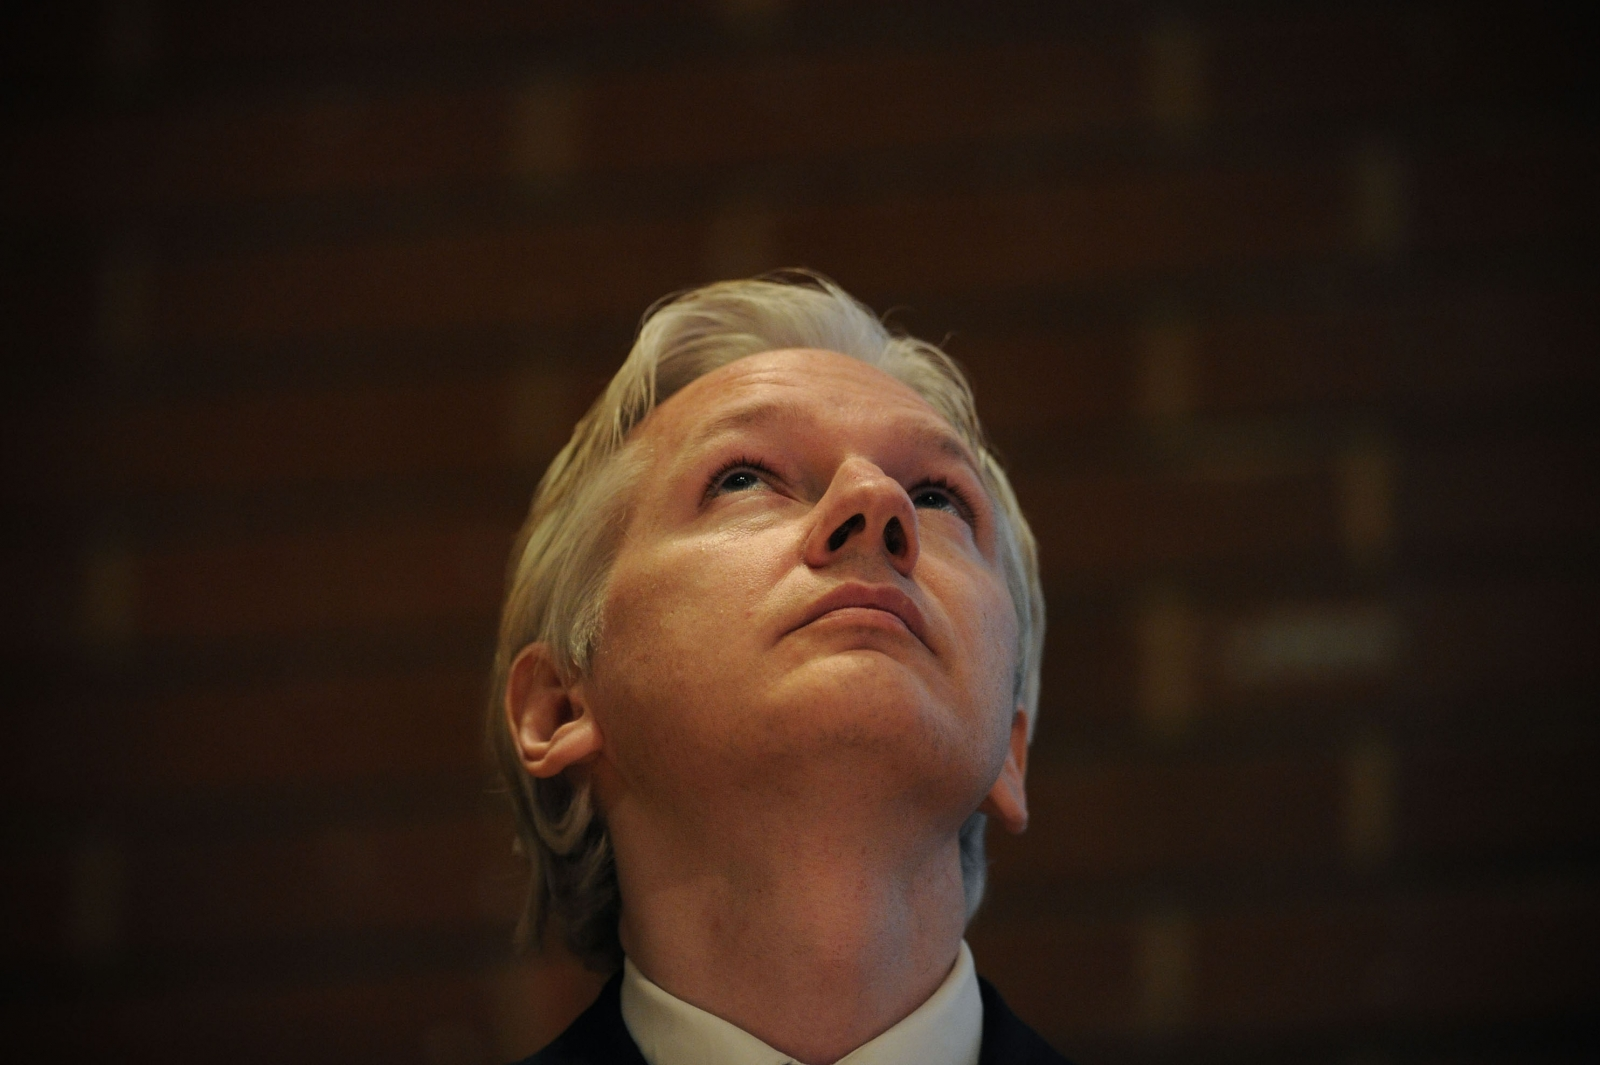 Julian Assange 'deeply shocked' and 'heartbroken' over Sweden's denial of funeral pass request